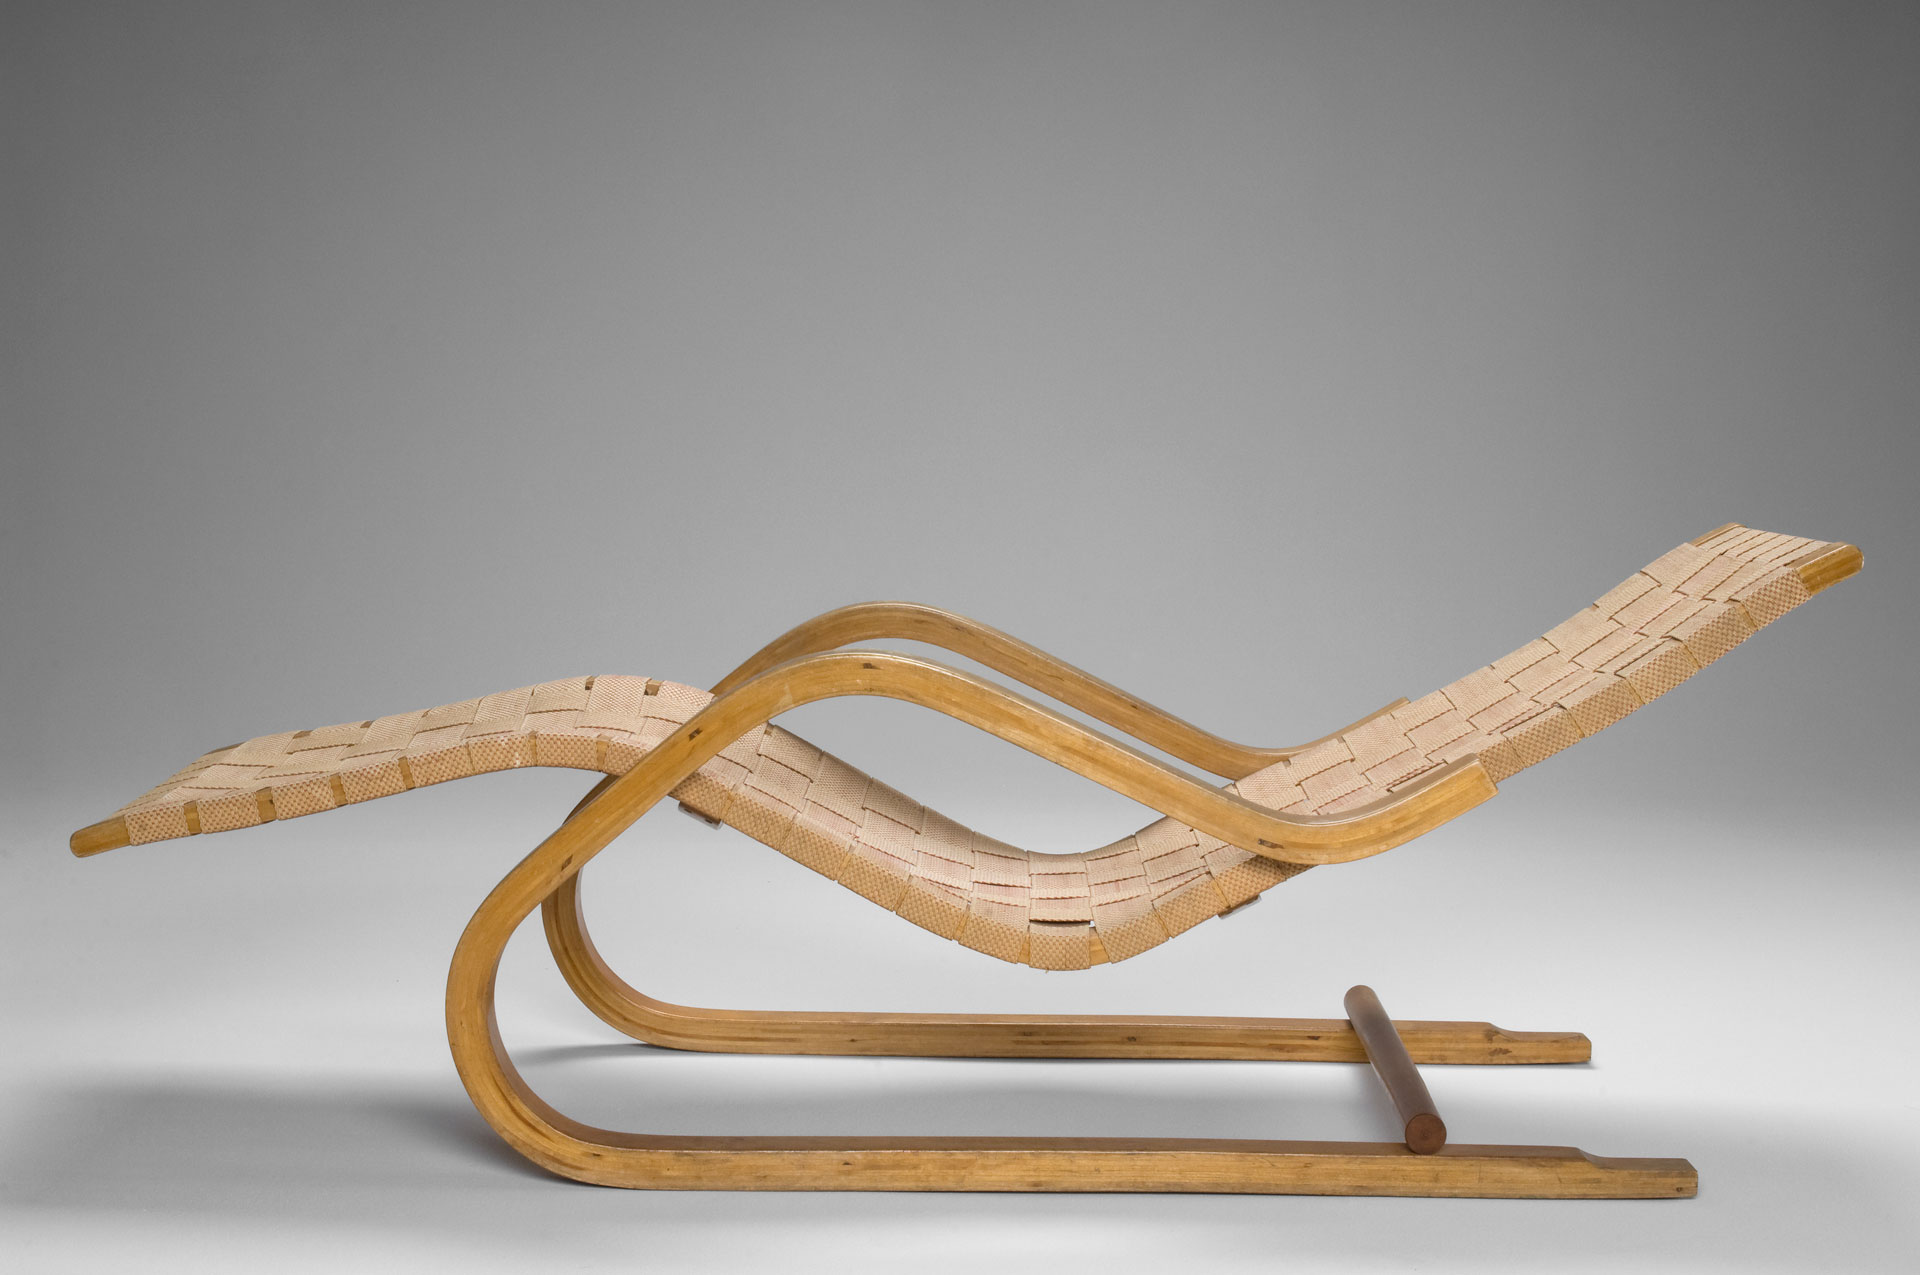 Surprising Jacksons Lounge Chair No 43 Alvar Aalto Pabps2019 Chair Design Images Pabps2019Com